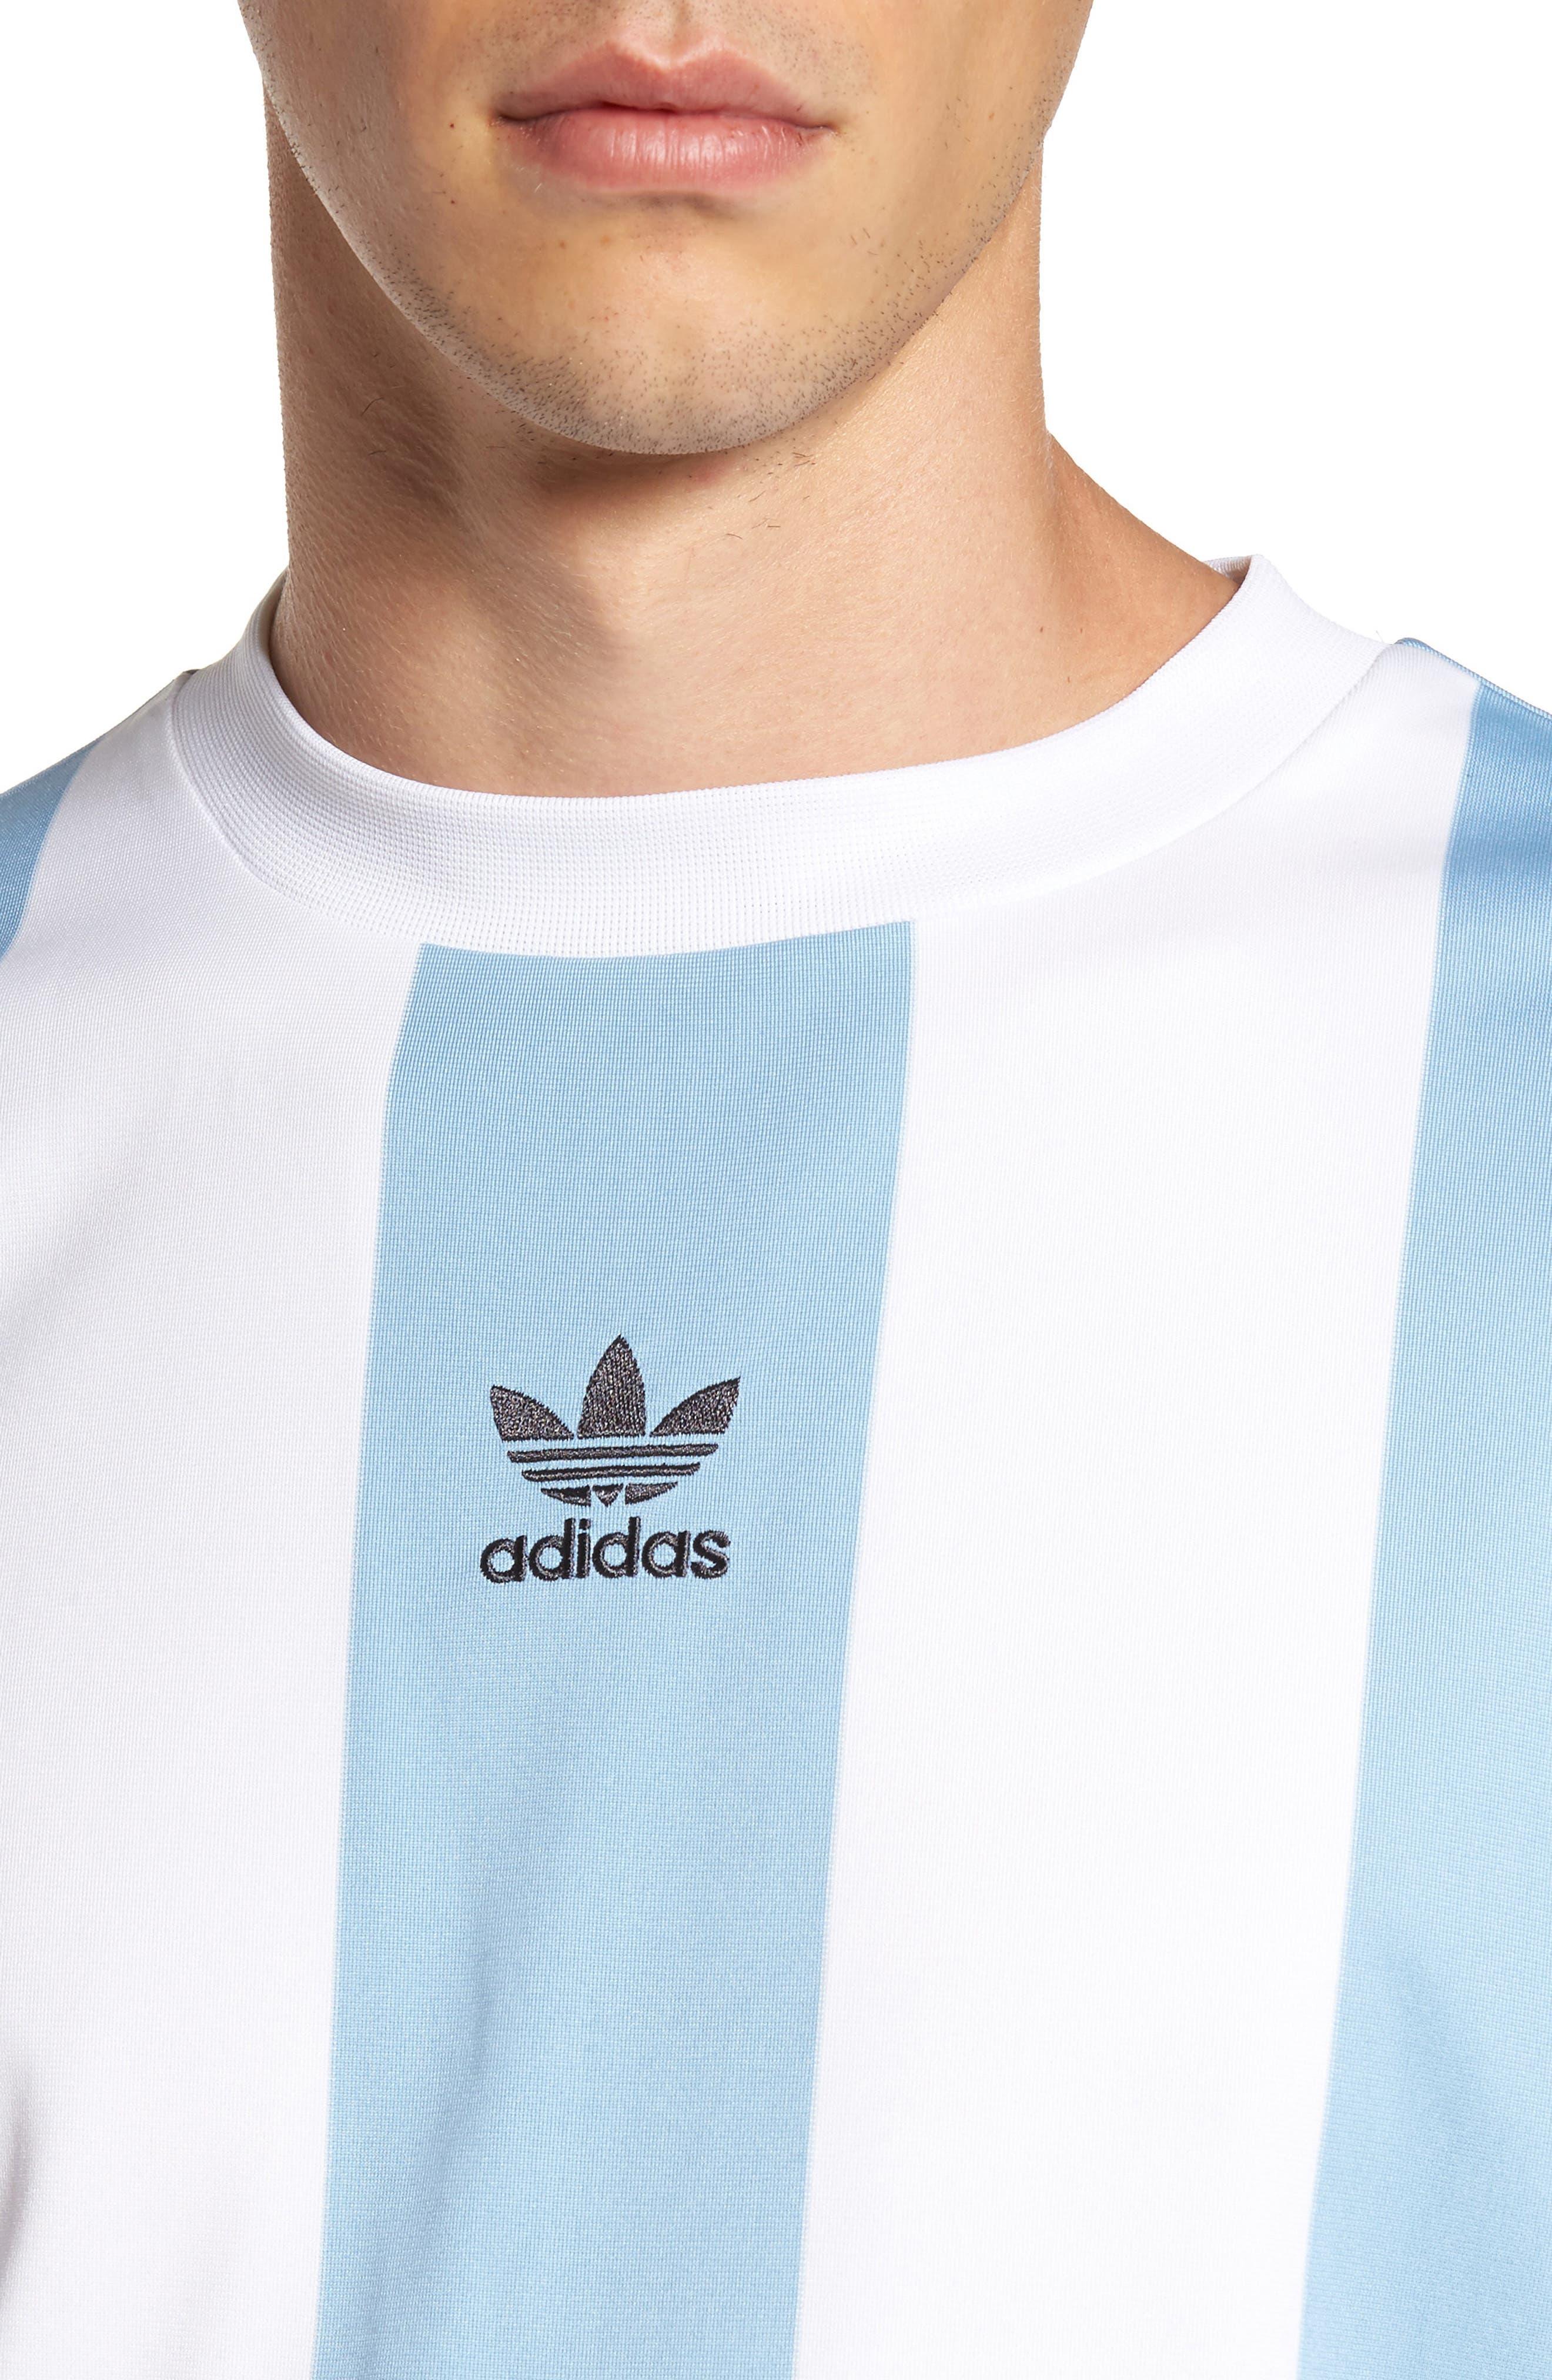 Originals Rival Goalie T-Shirt,                             Alternate thumbnail 4, color,                             059